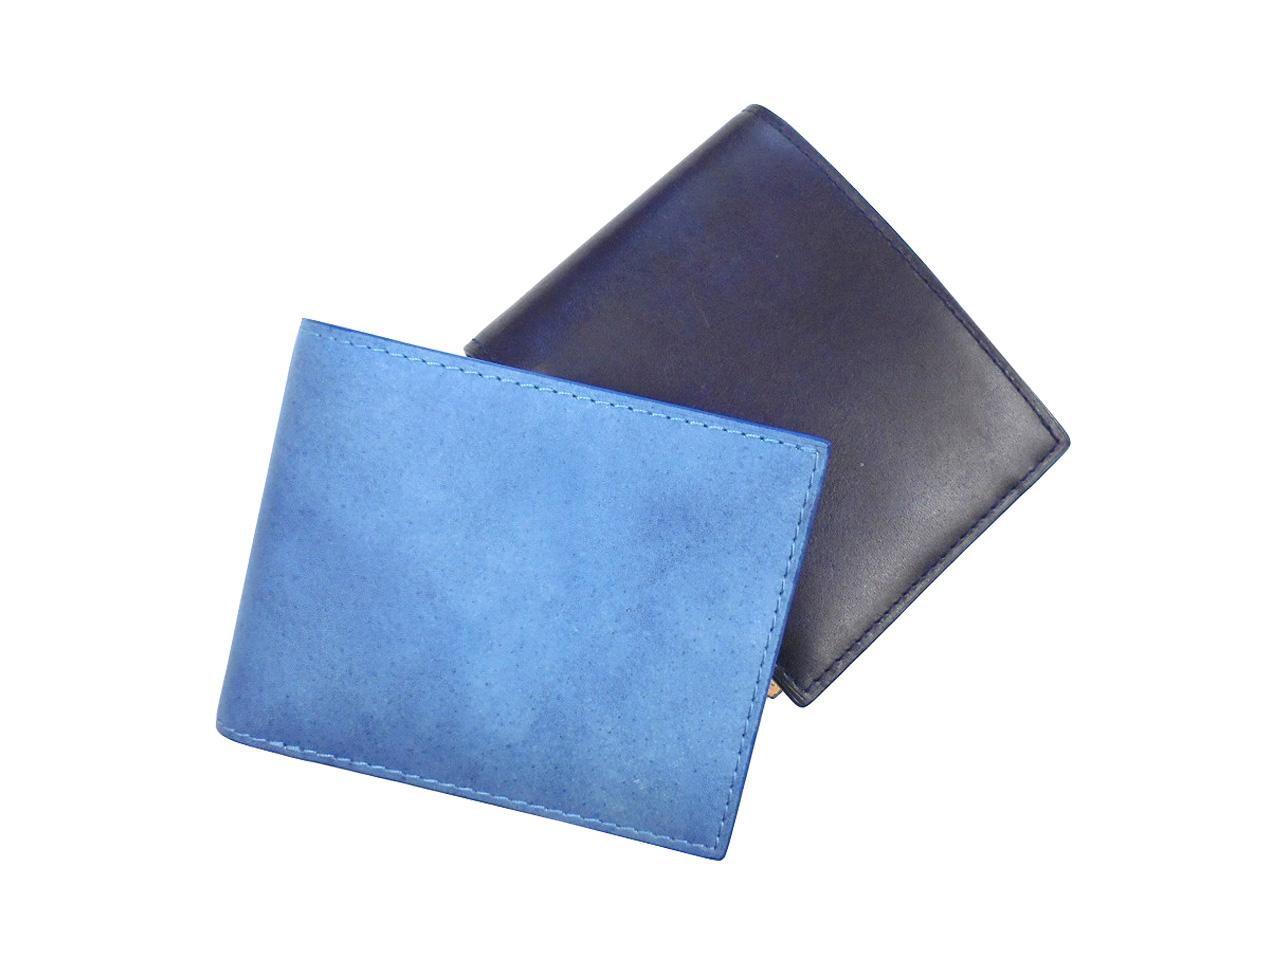 BAGGY PORT バギーポート KOI インディゴ DYE スムース 藍染 WALLET 二つ折り財布 札入れ BOX型小銭入れ ZYS-098